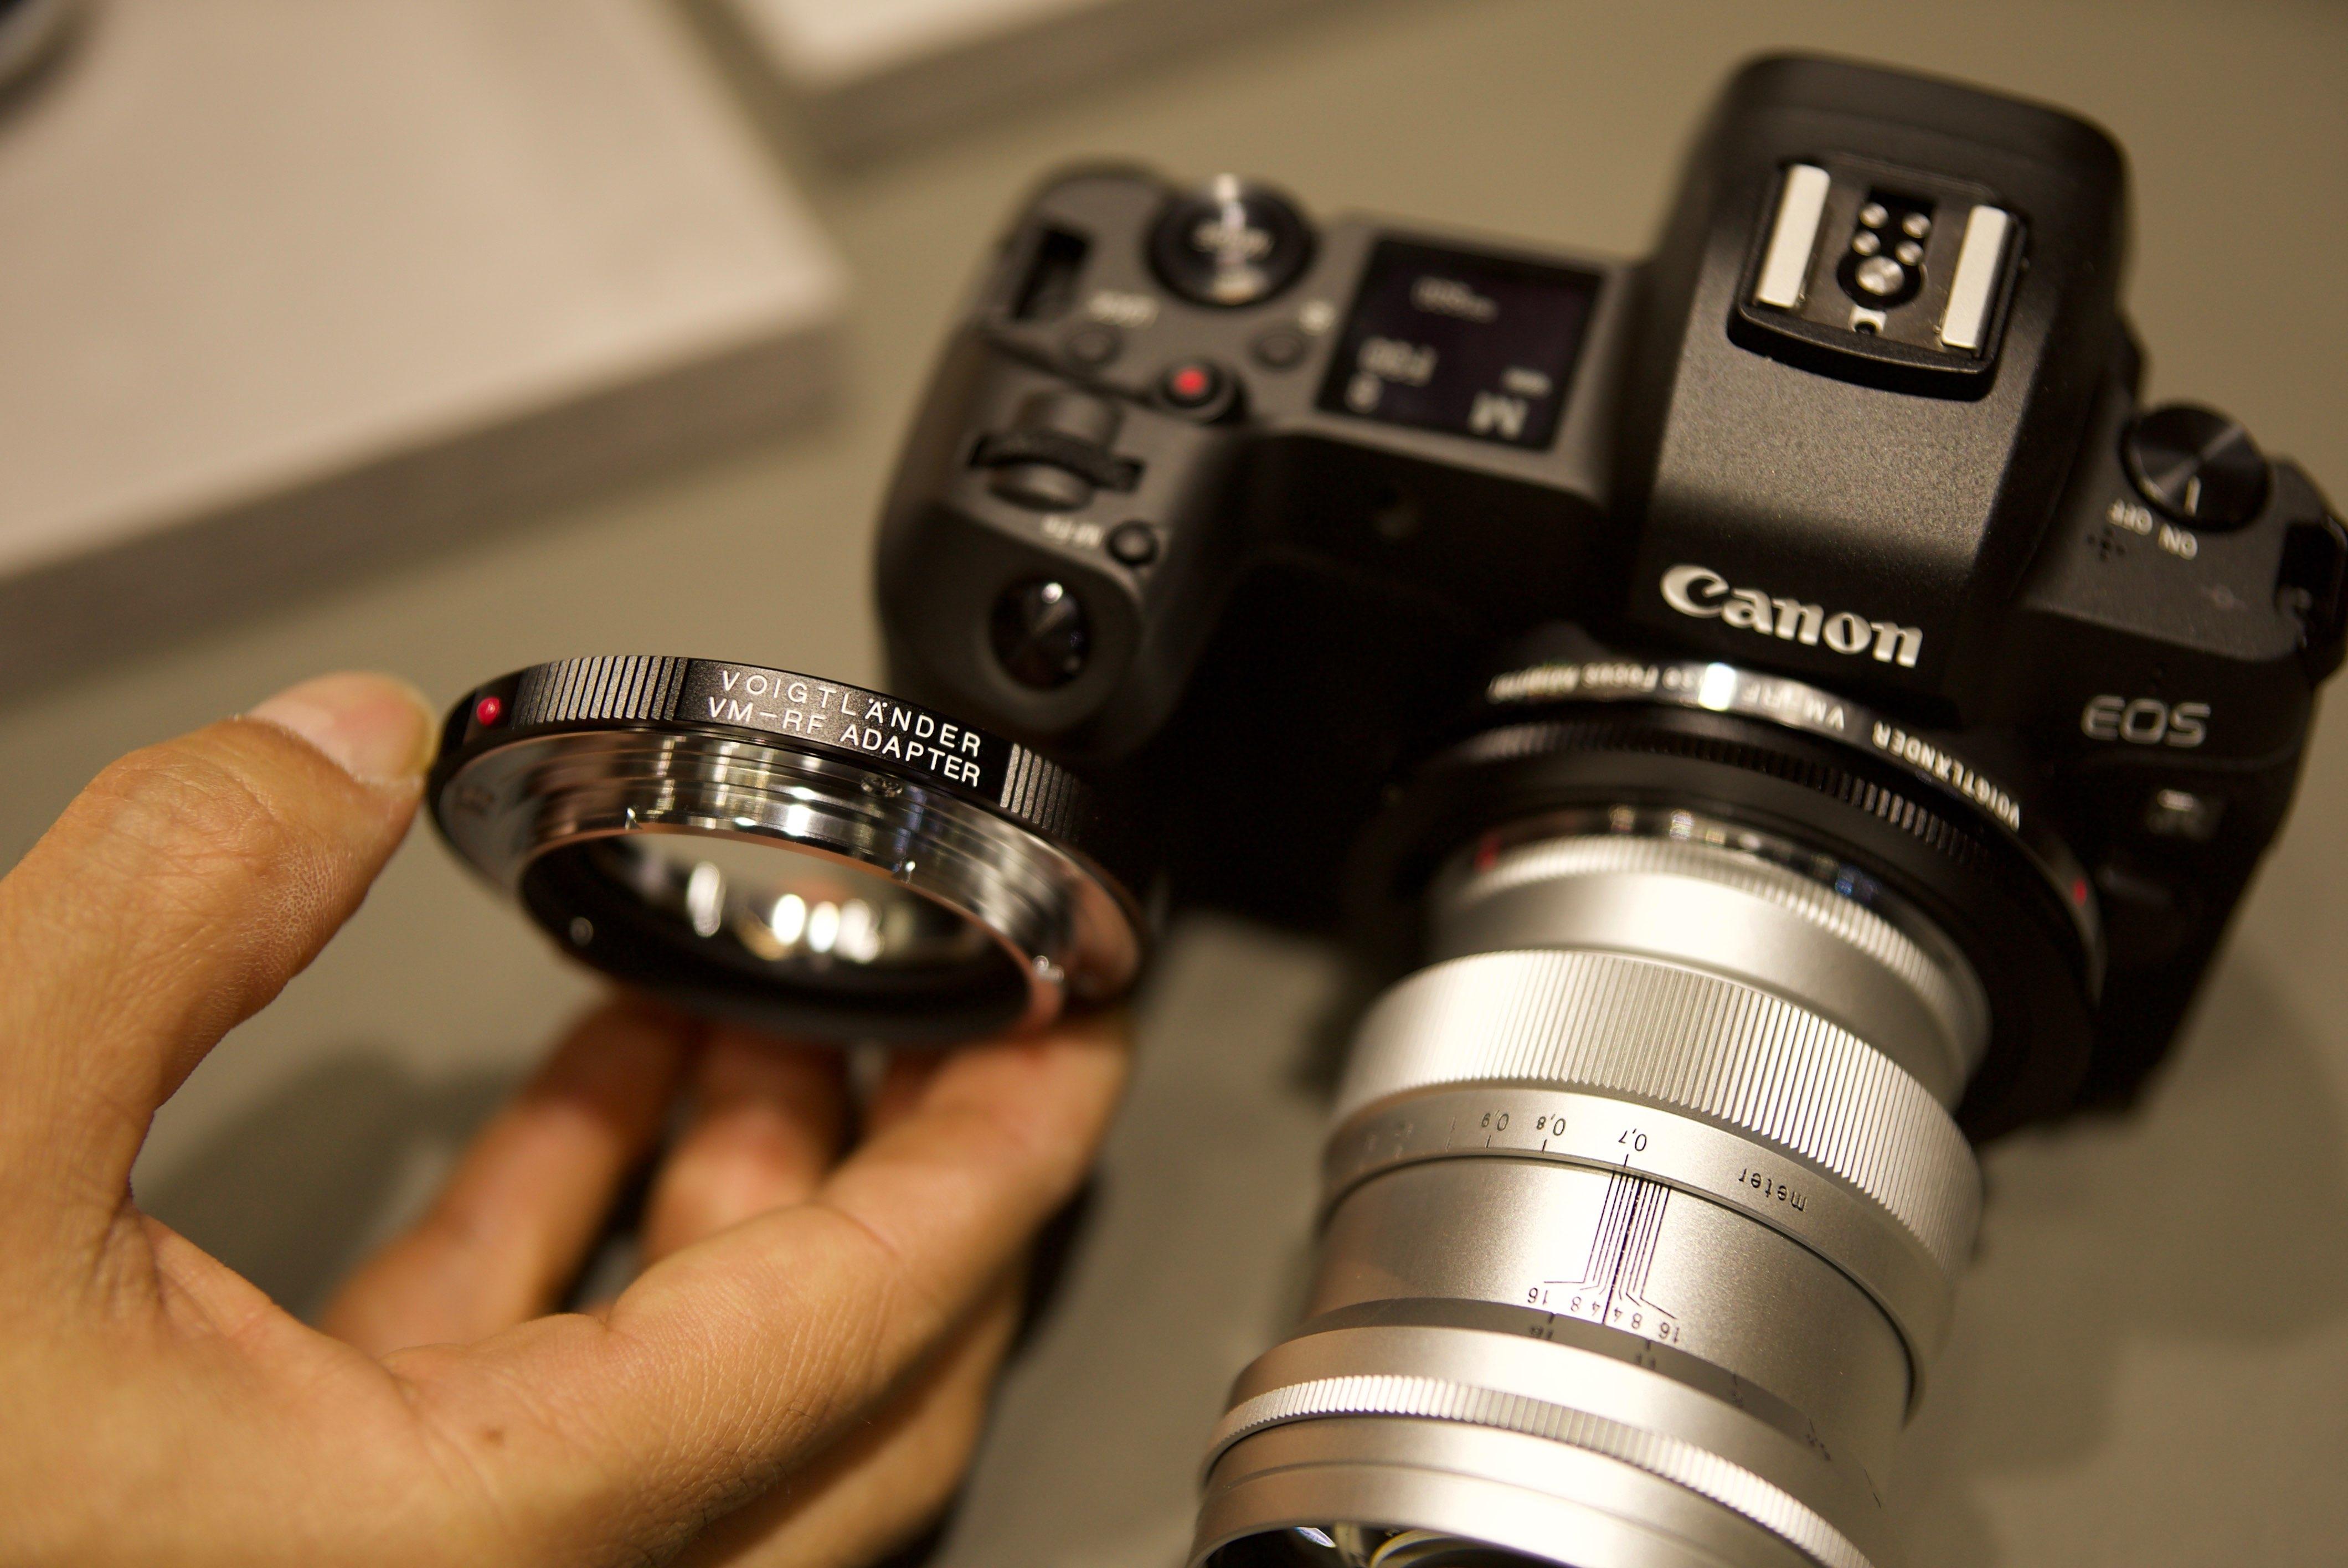 New Voigtlander NOKTON lenses at CP+ 2019